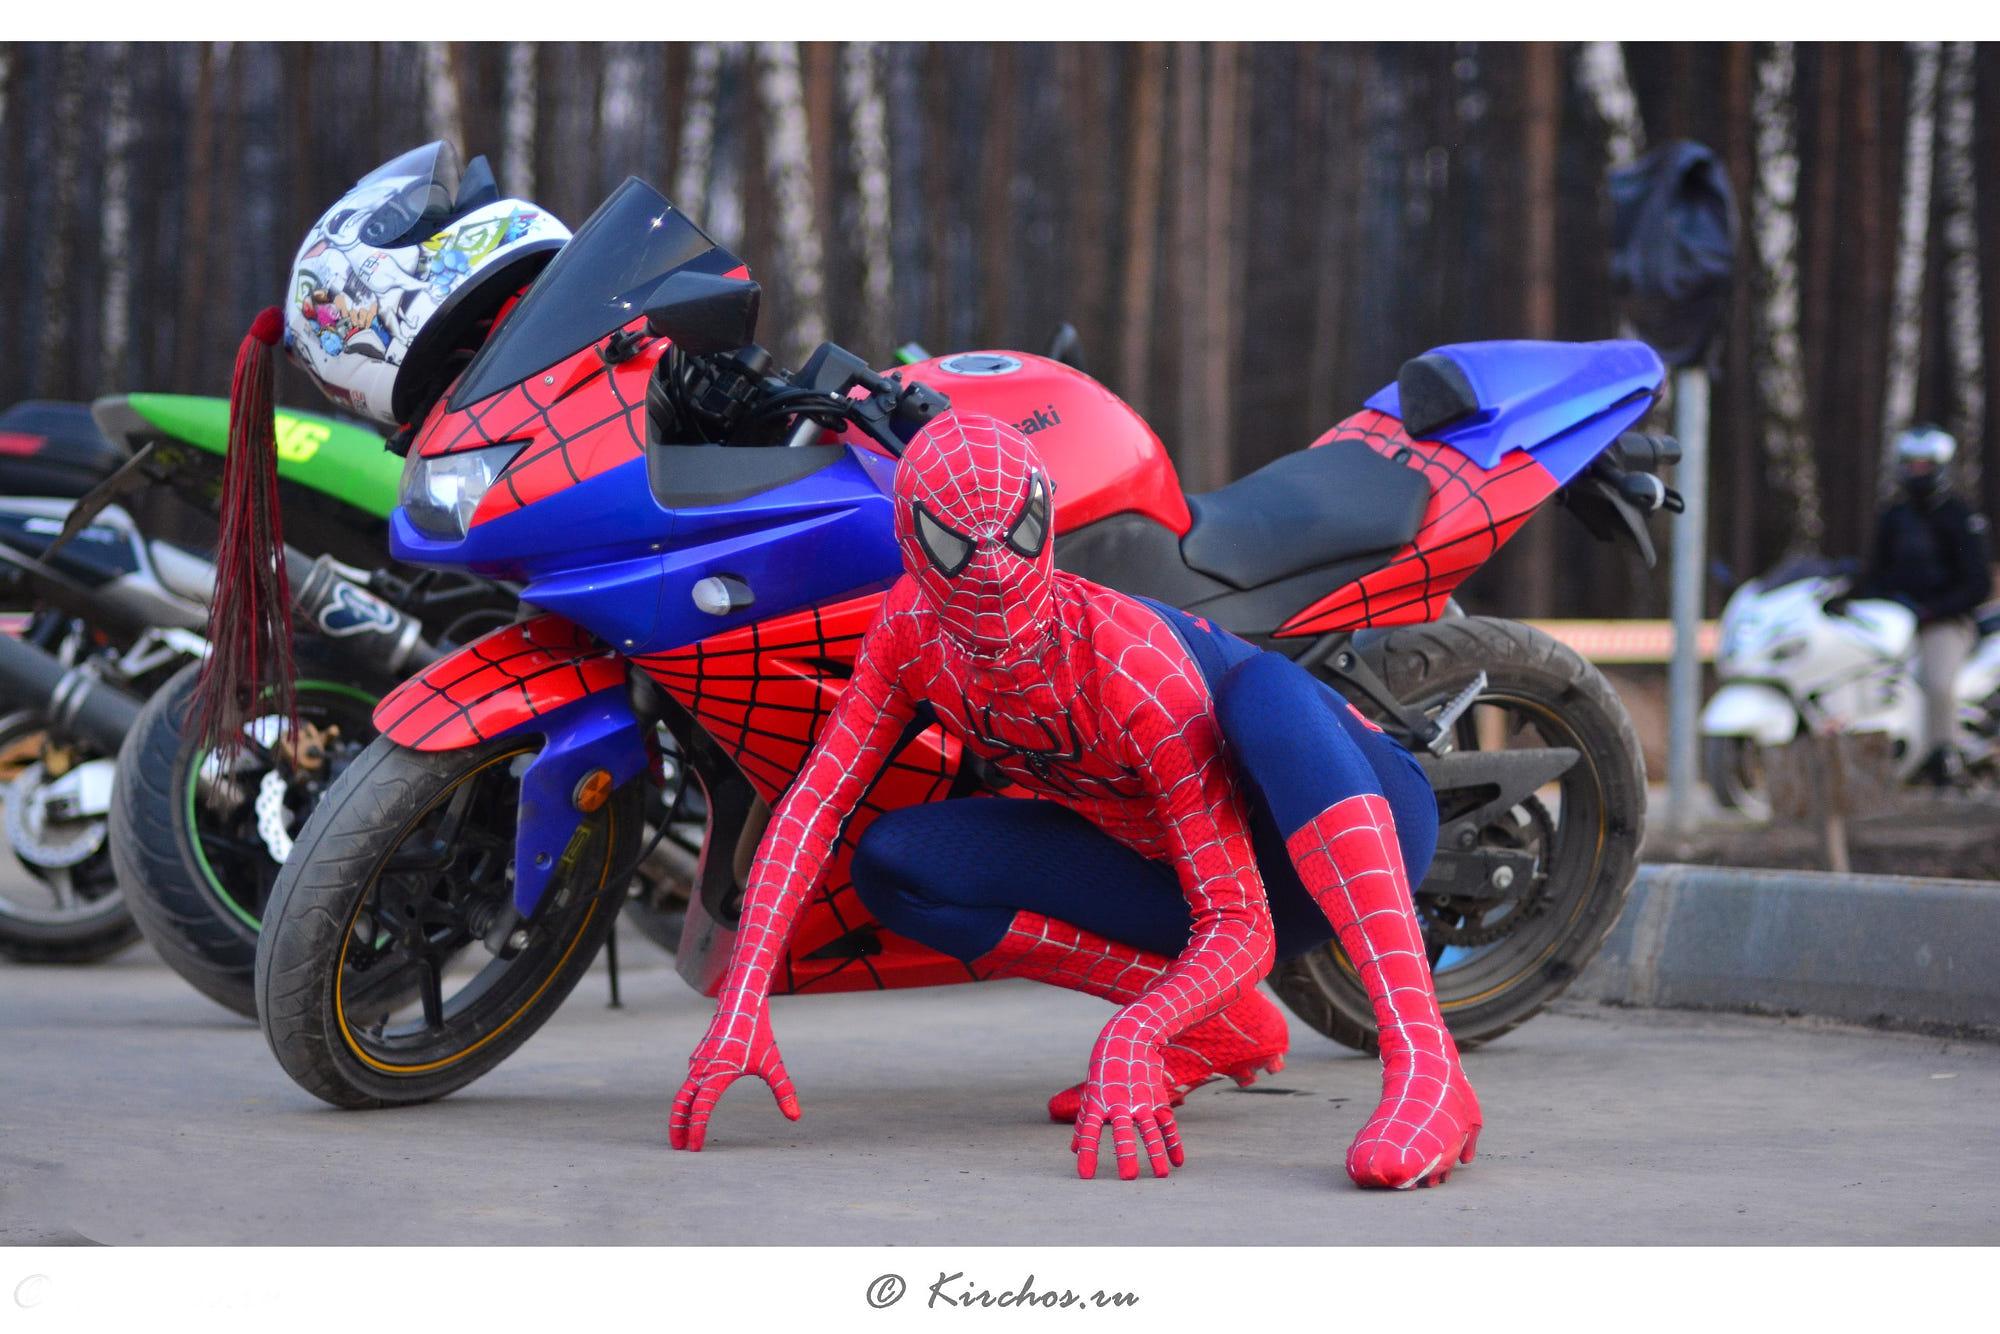 Spiderman moto by kirchos skv photo 68146209 500px - Spider man moto ...